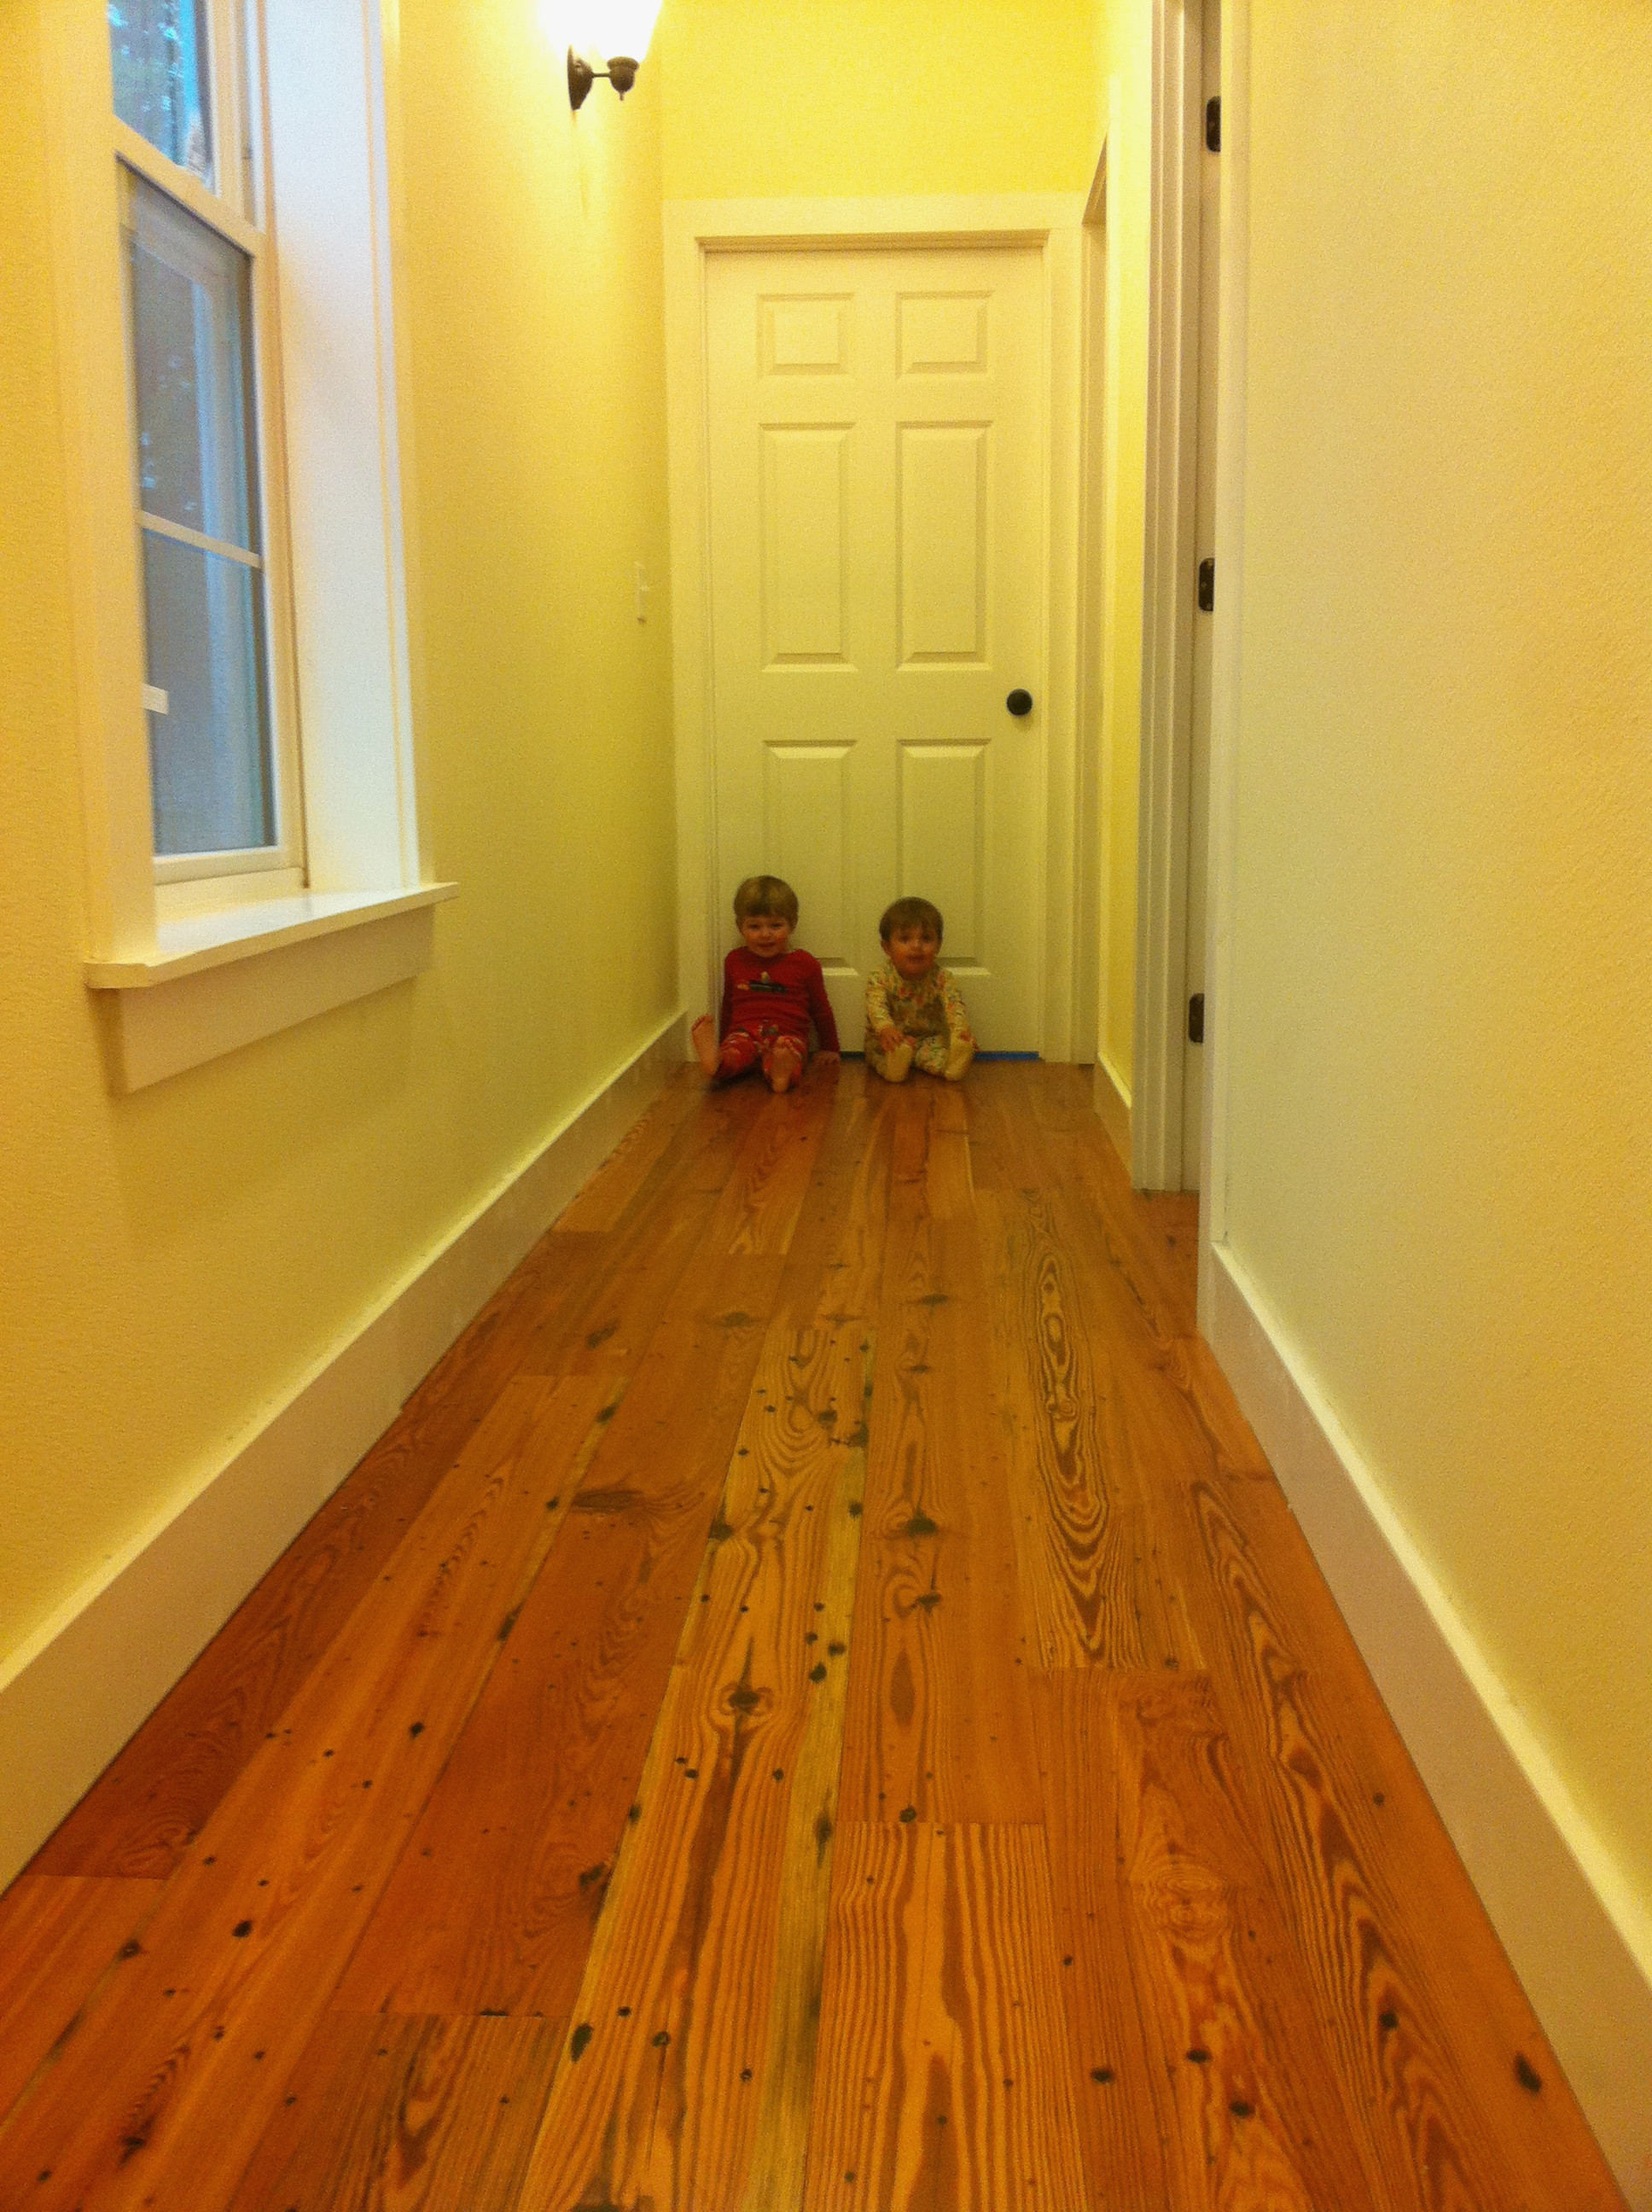 21 Fashionable Hardwood Flooring asheville Nc 2021 free download hardwood flooring asheville nc of hallway flooring gallery regarding why boys should grow up on hardwood floors